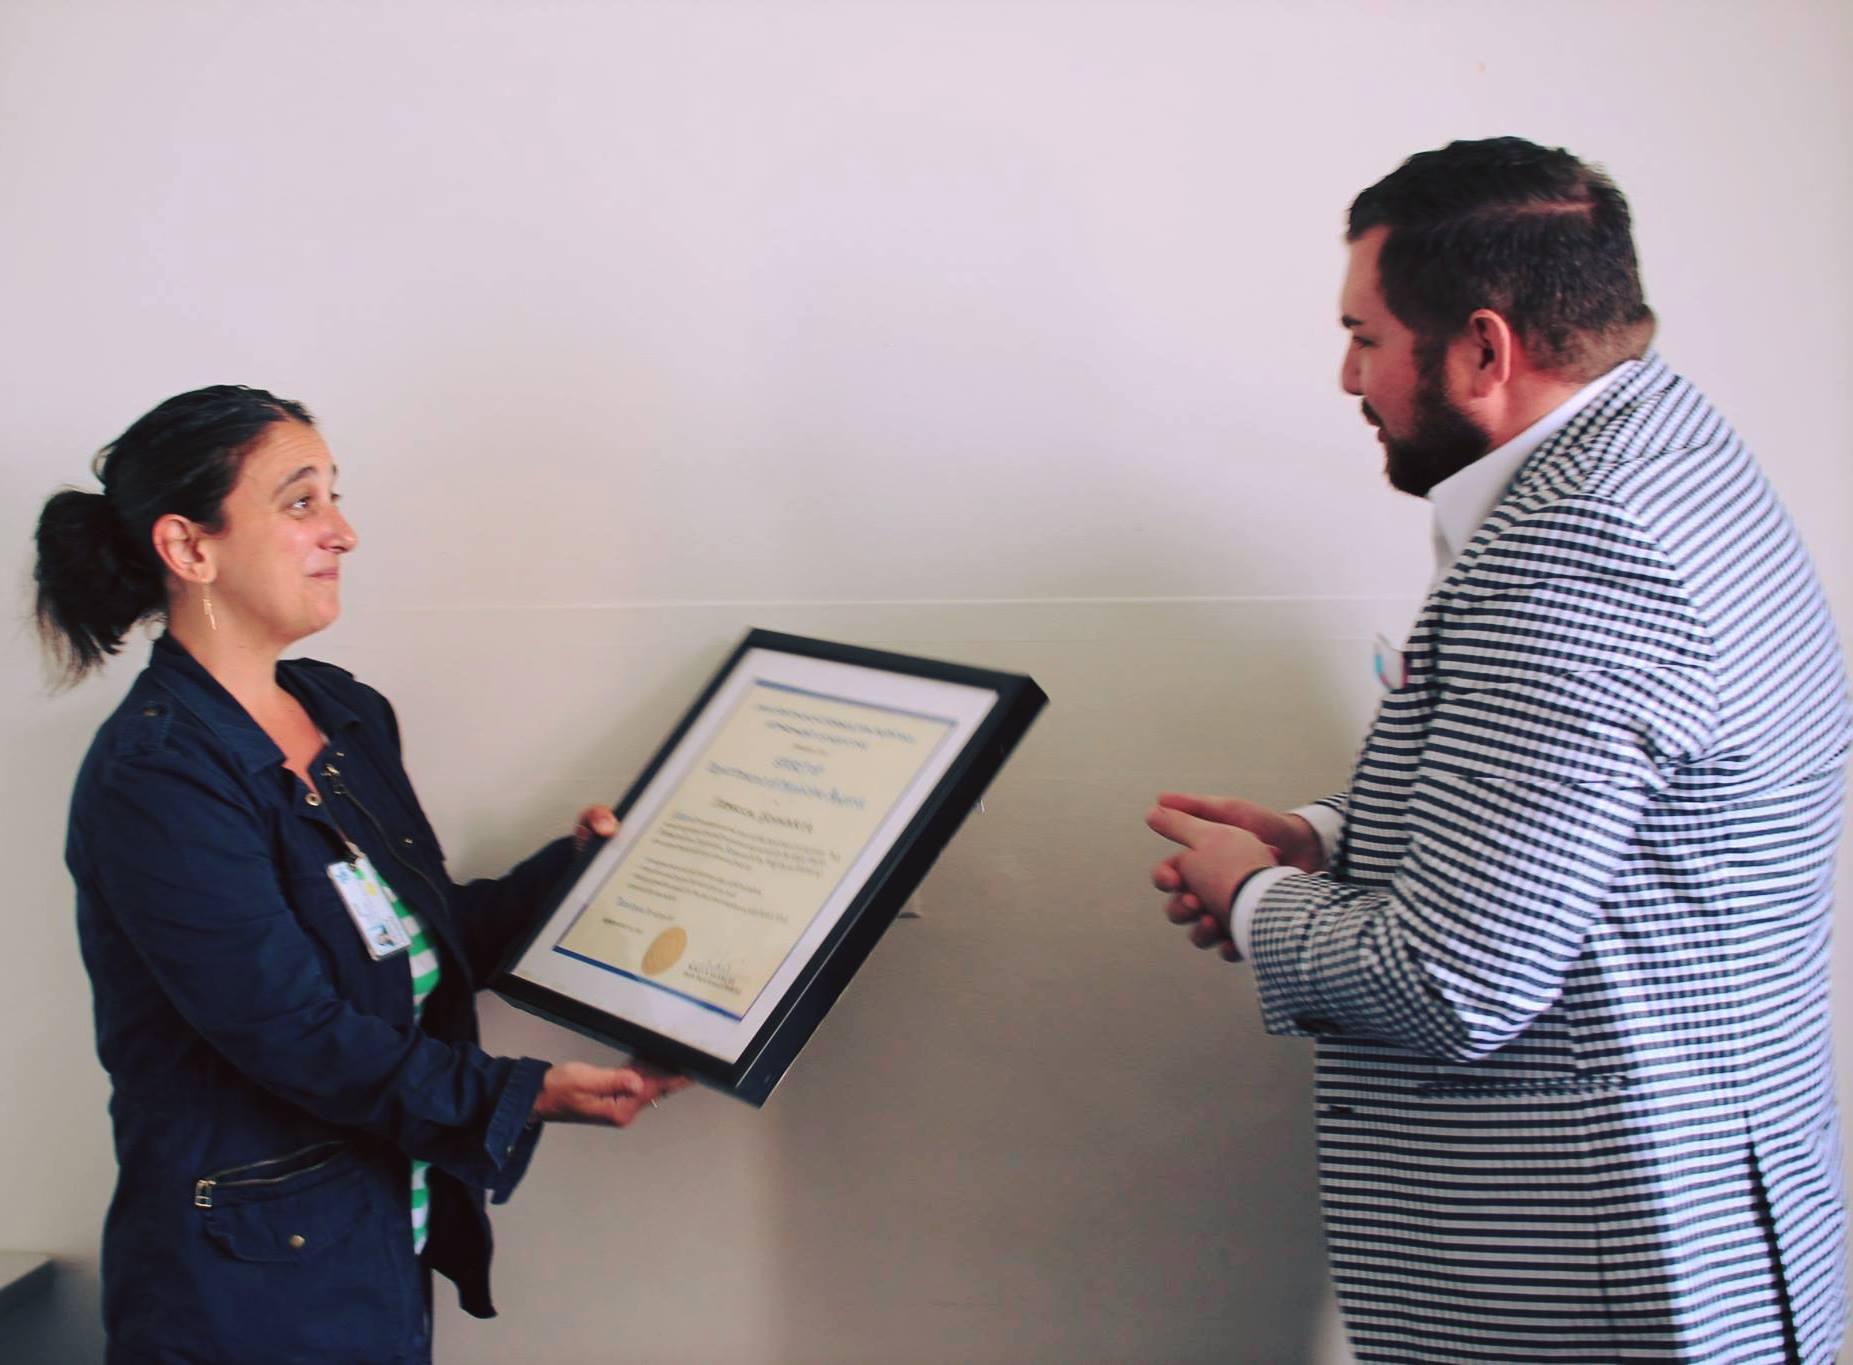 HIVE Social Worker Becca Schwartz Receives UCSF Department